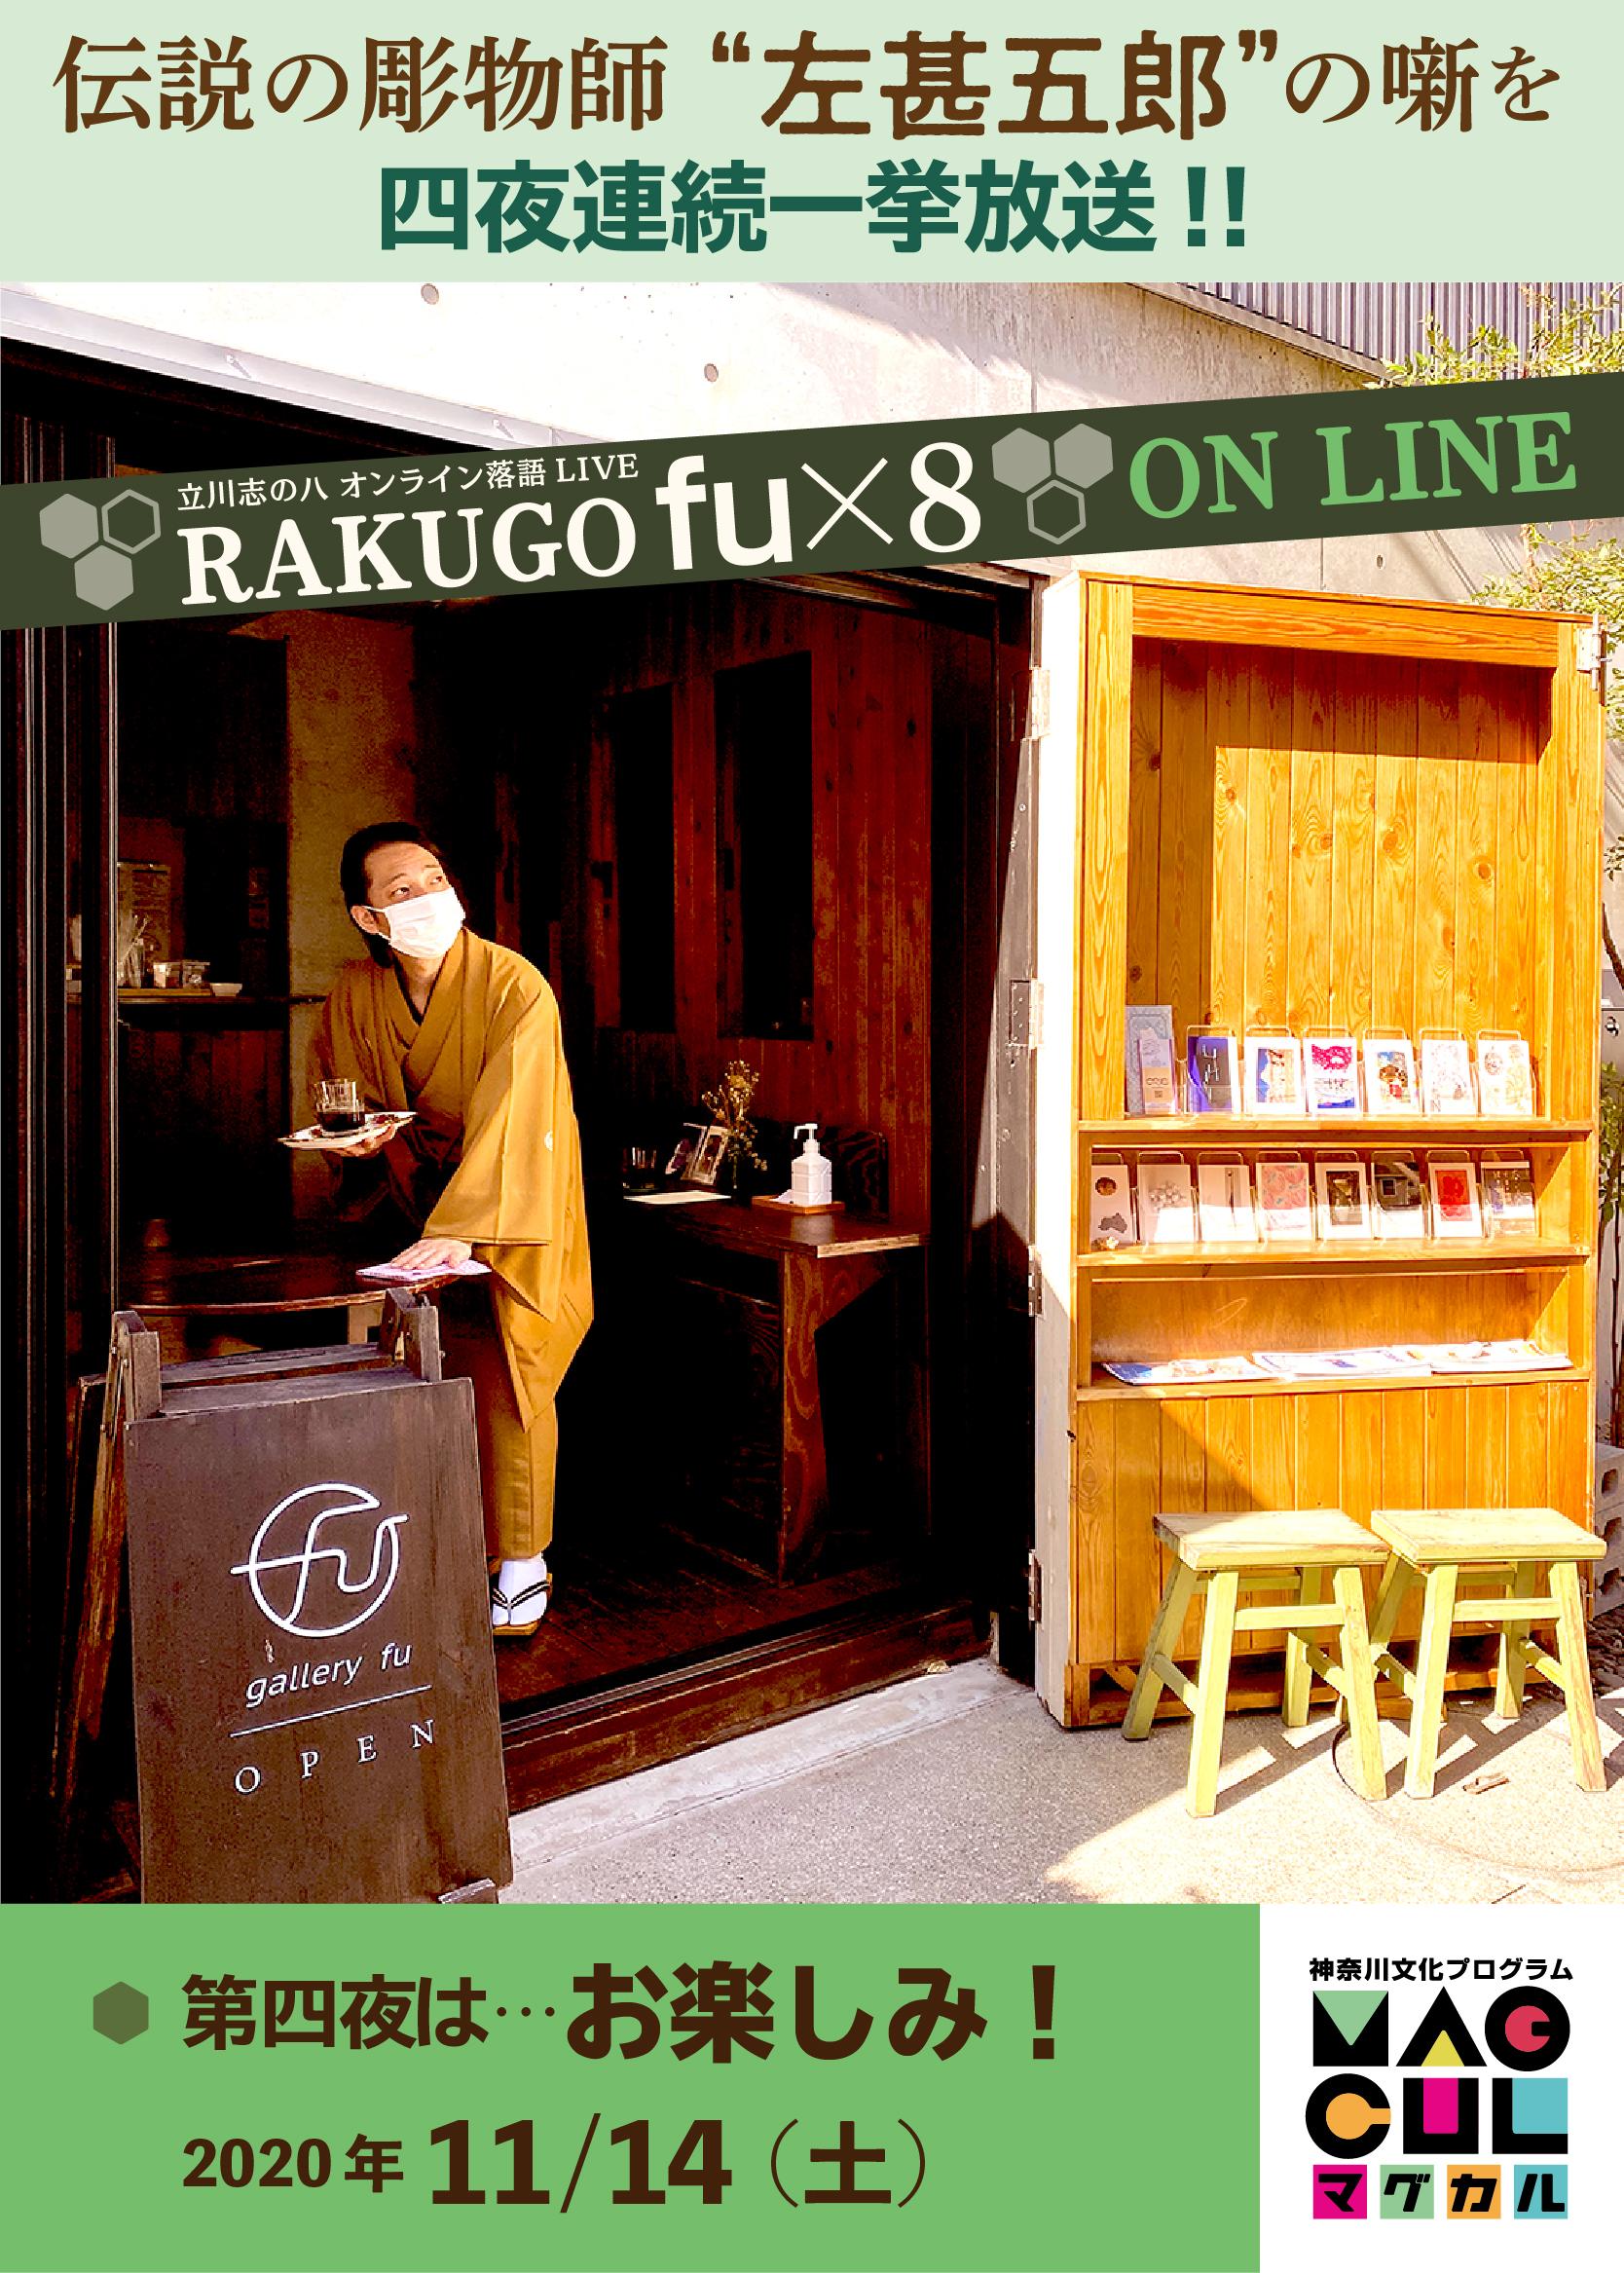 RAKUGO fu×8 ONLINE 第四夜は…お楽しみ!